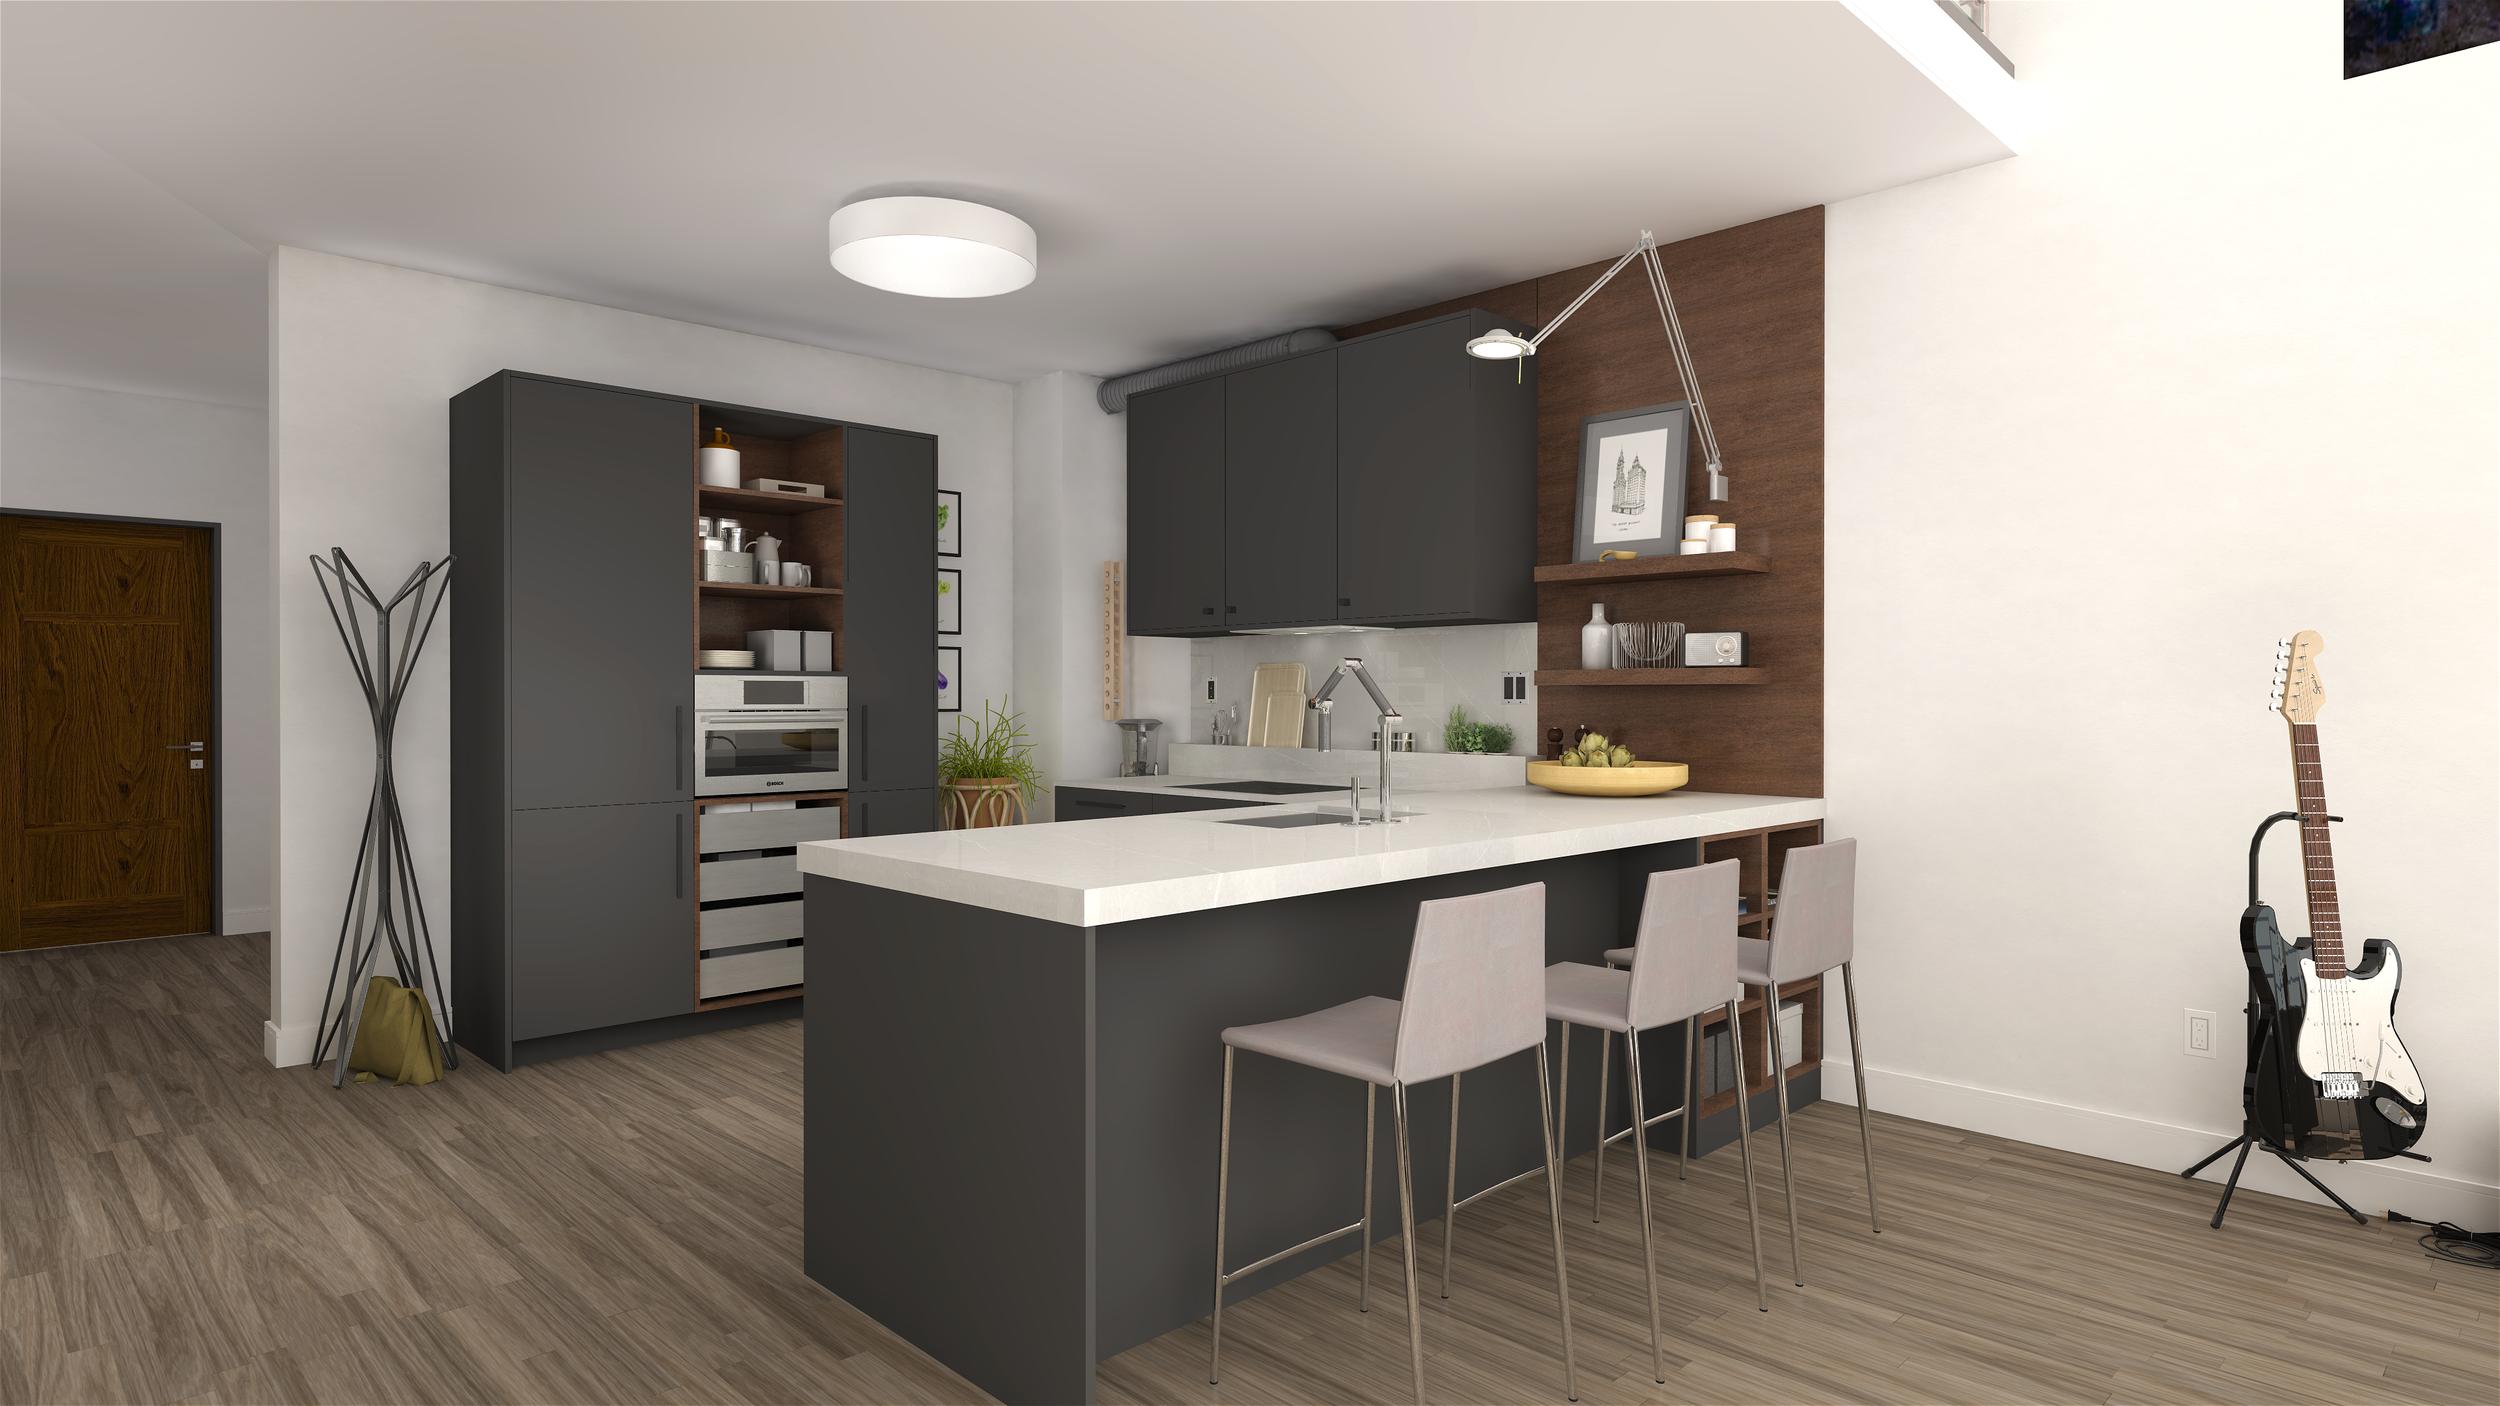 deSousaDESIGN_Kitchen_Urban_Condo_V1b_3840x2160.png